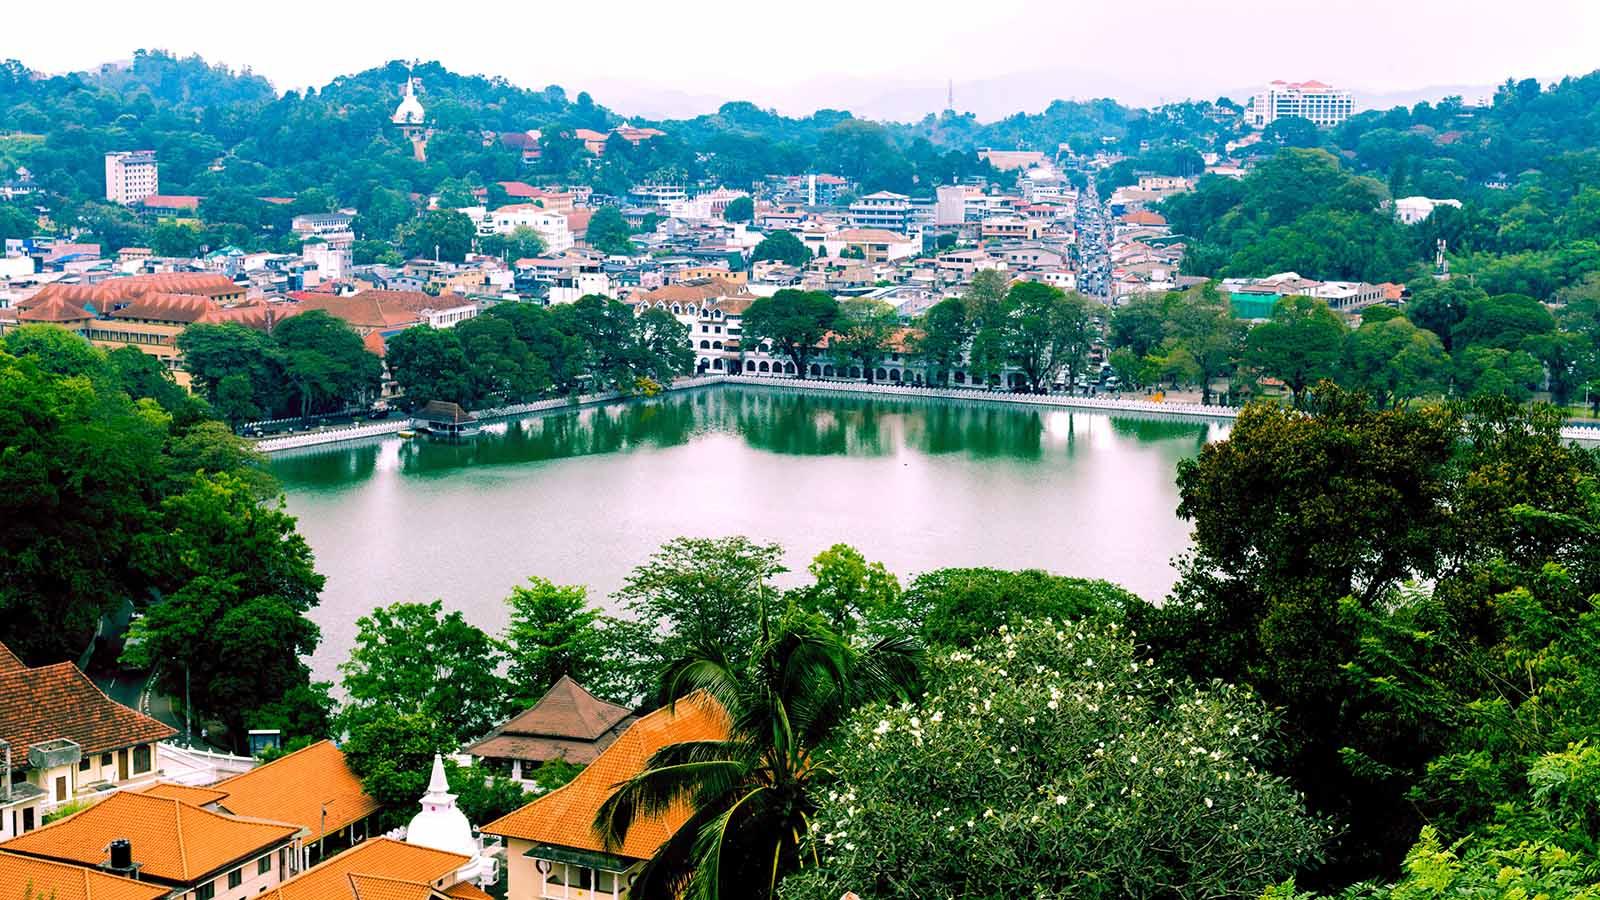 Aerial view of Kandy, Sri Lanka.